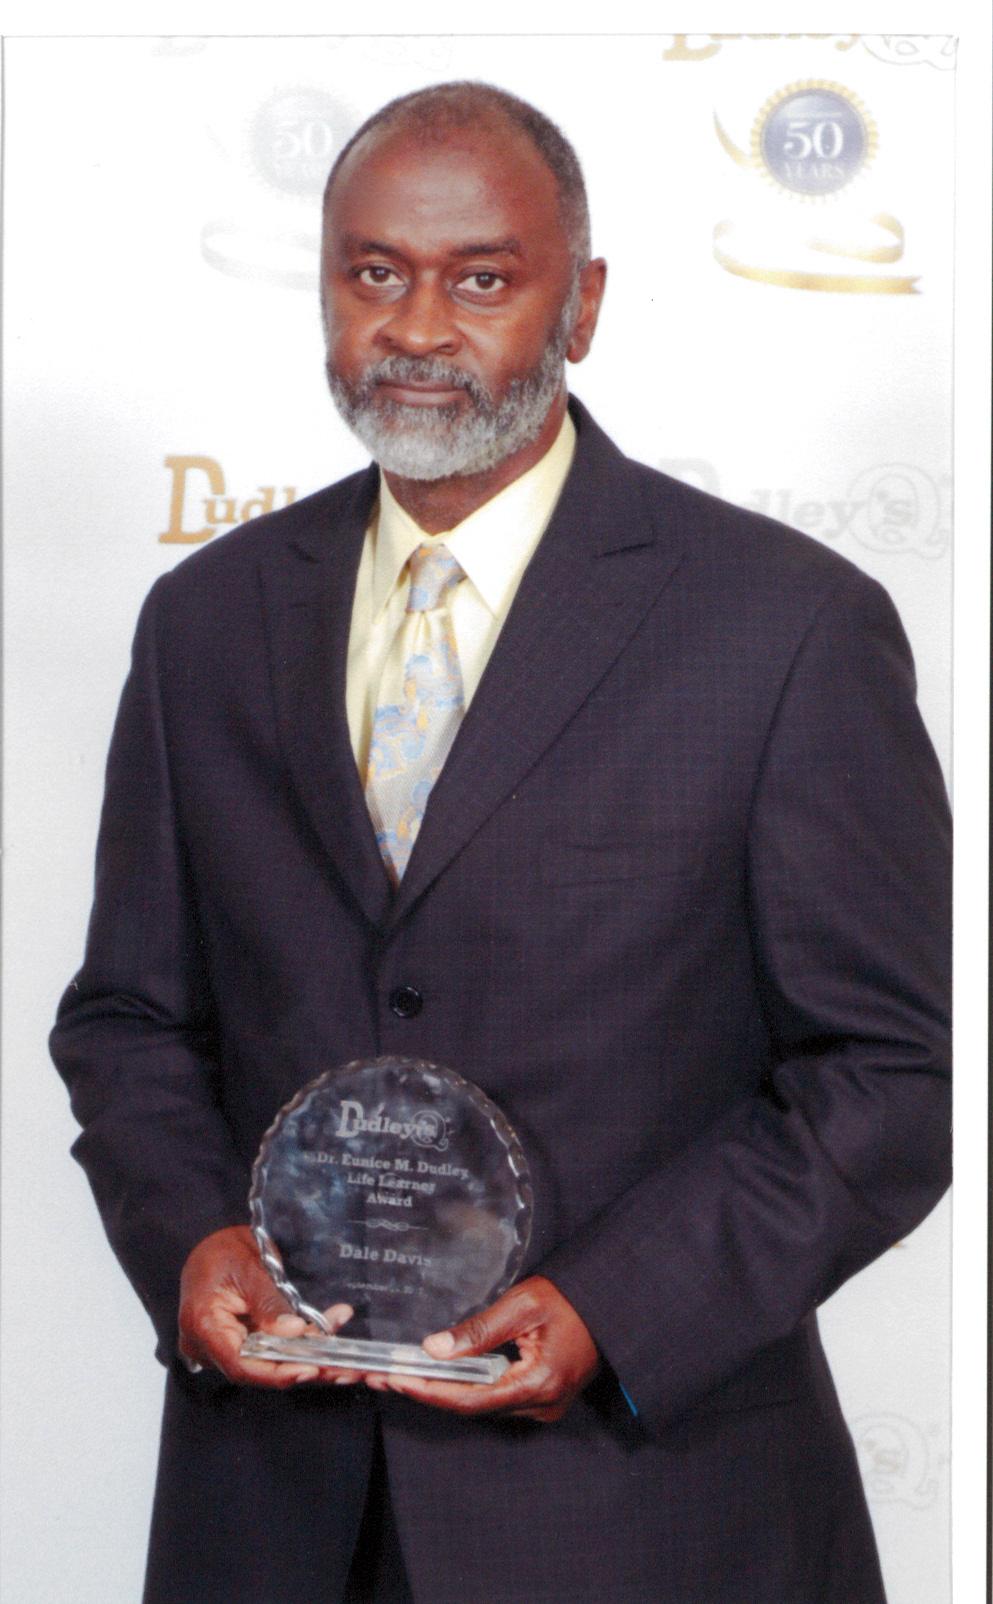 Dale Davis with award